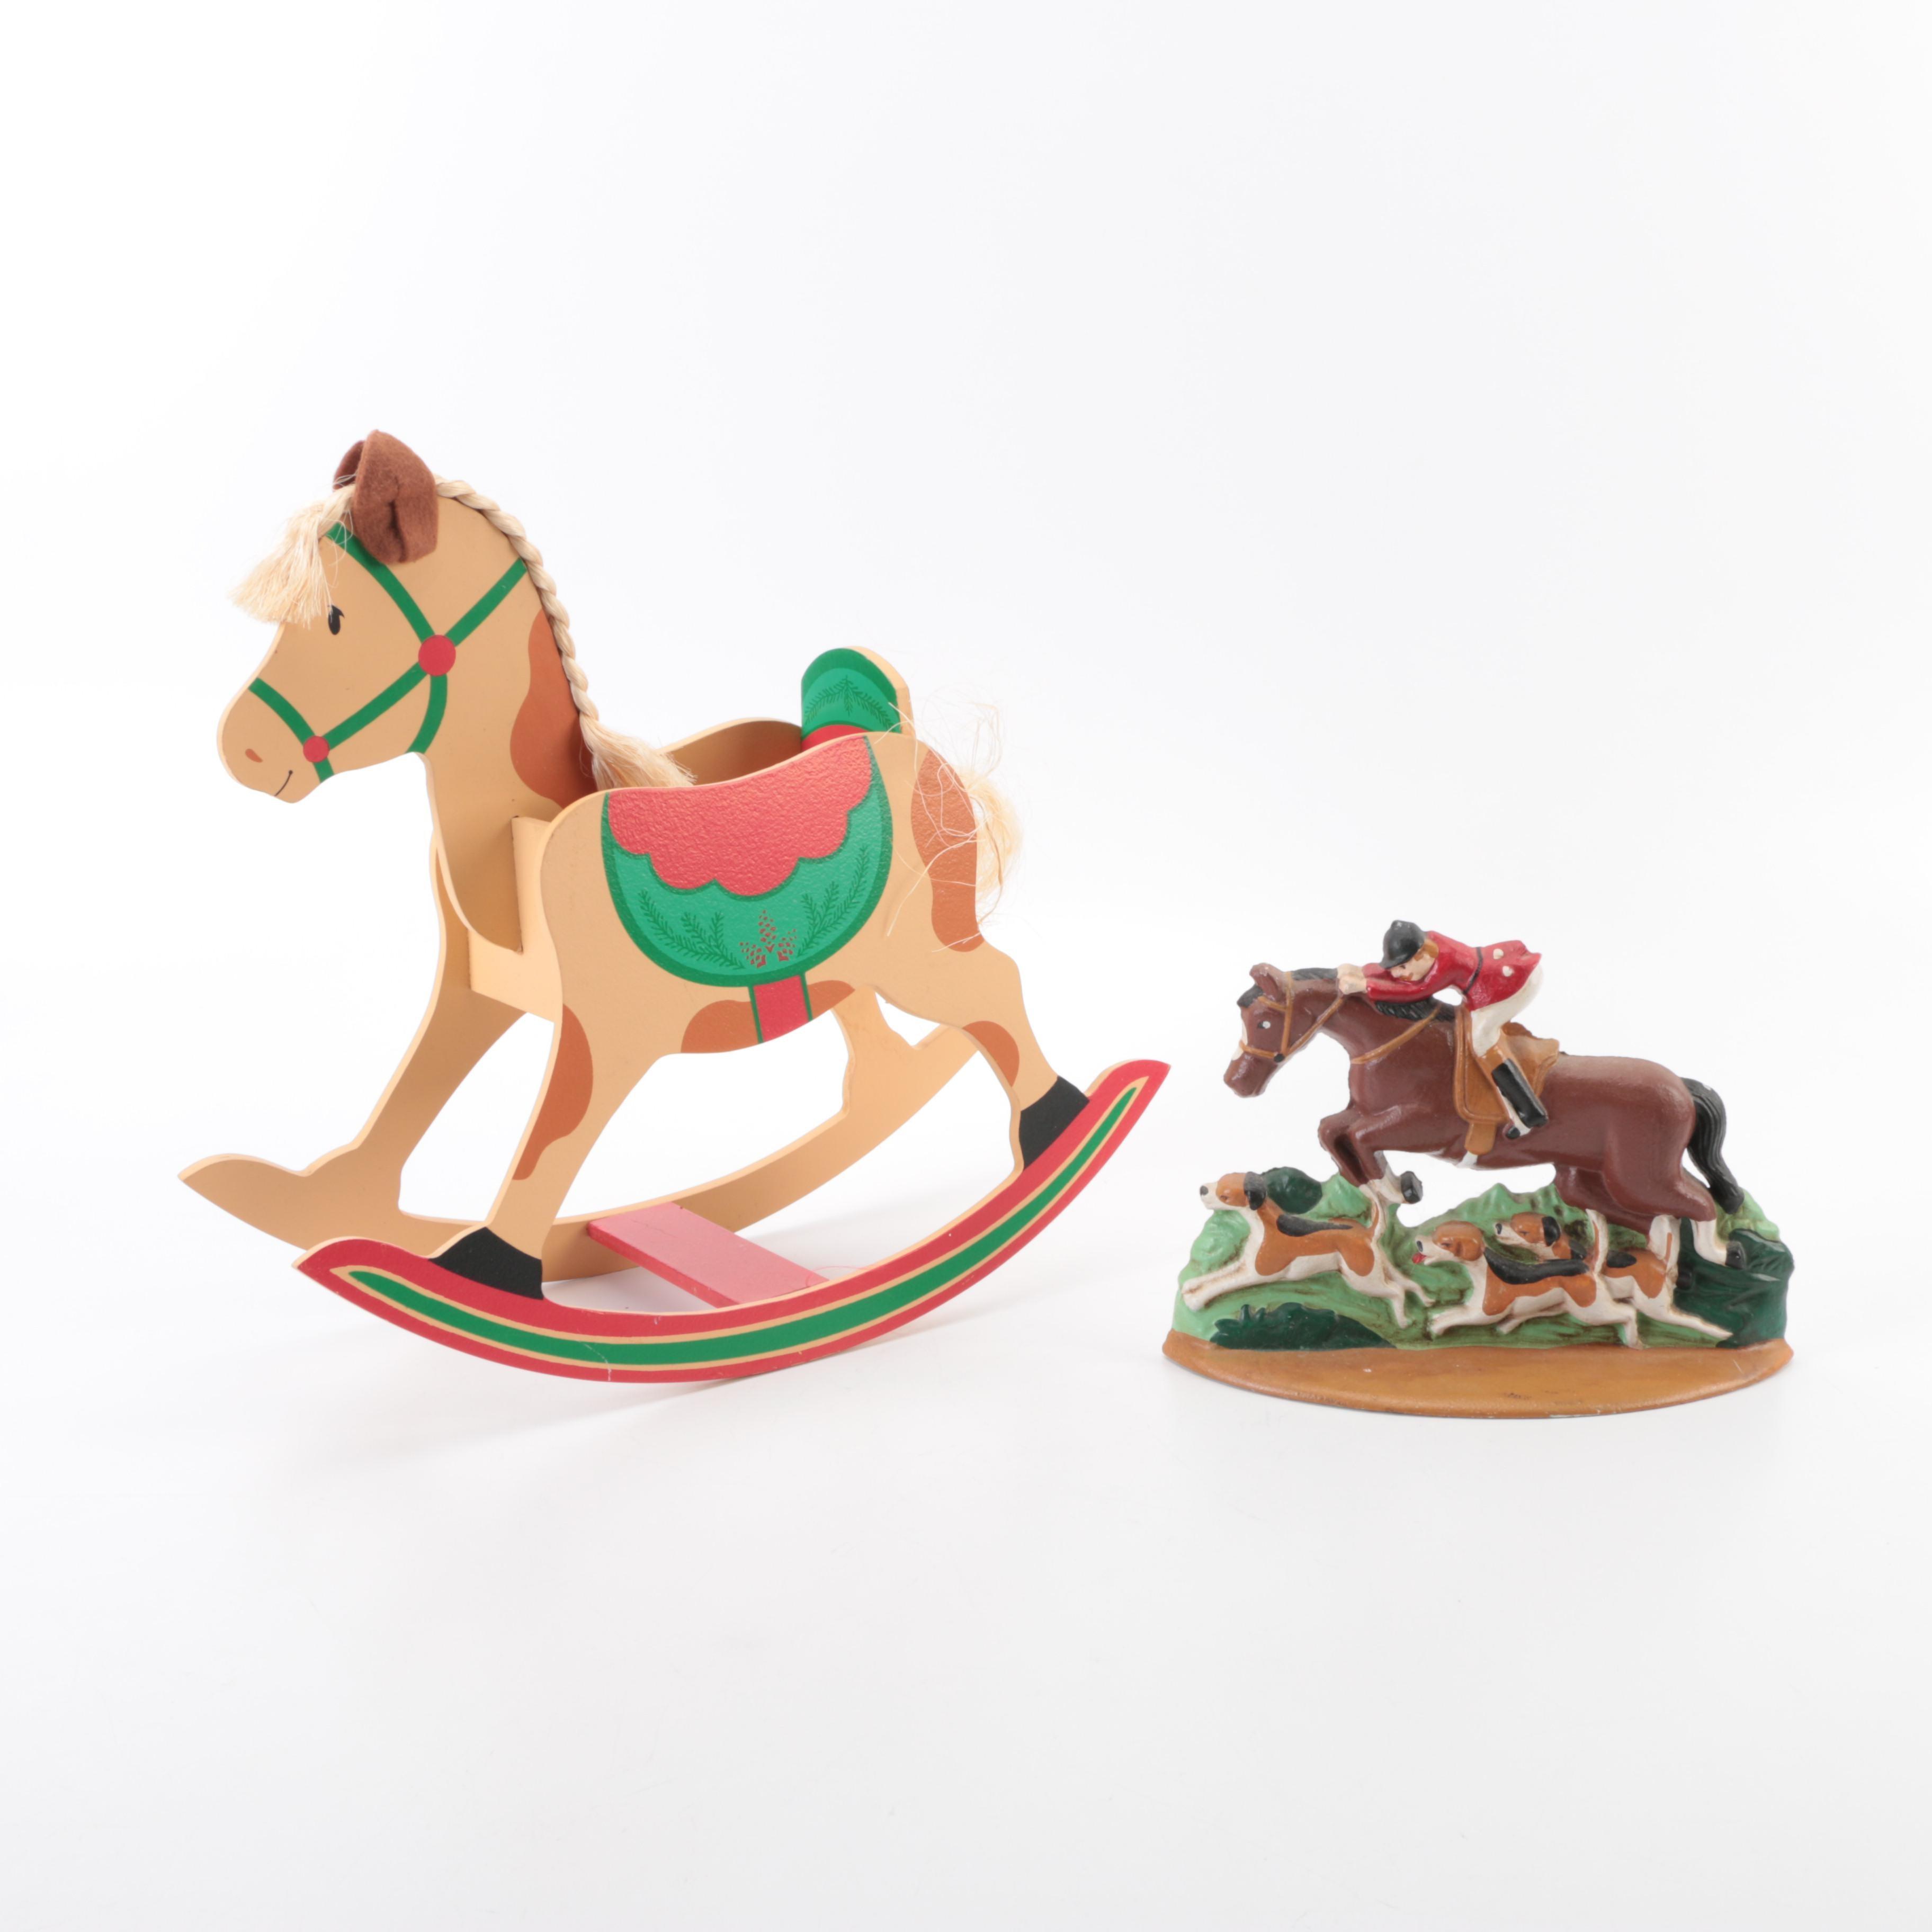 Decorative Horse Figurines